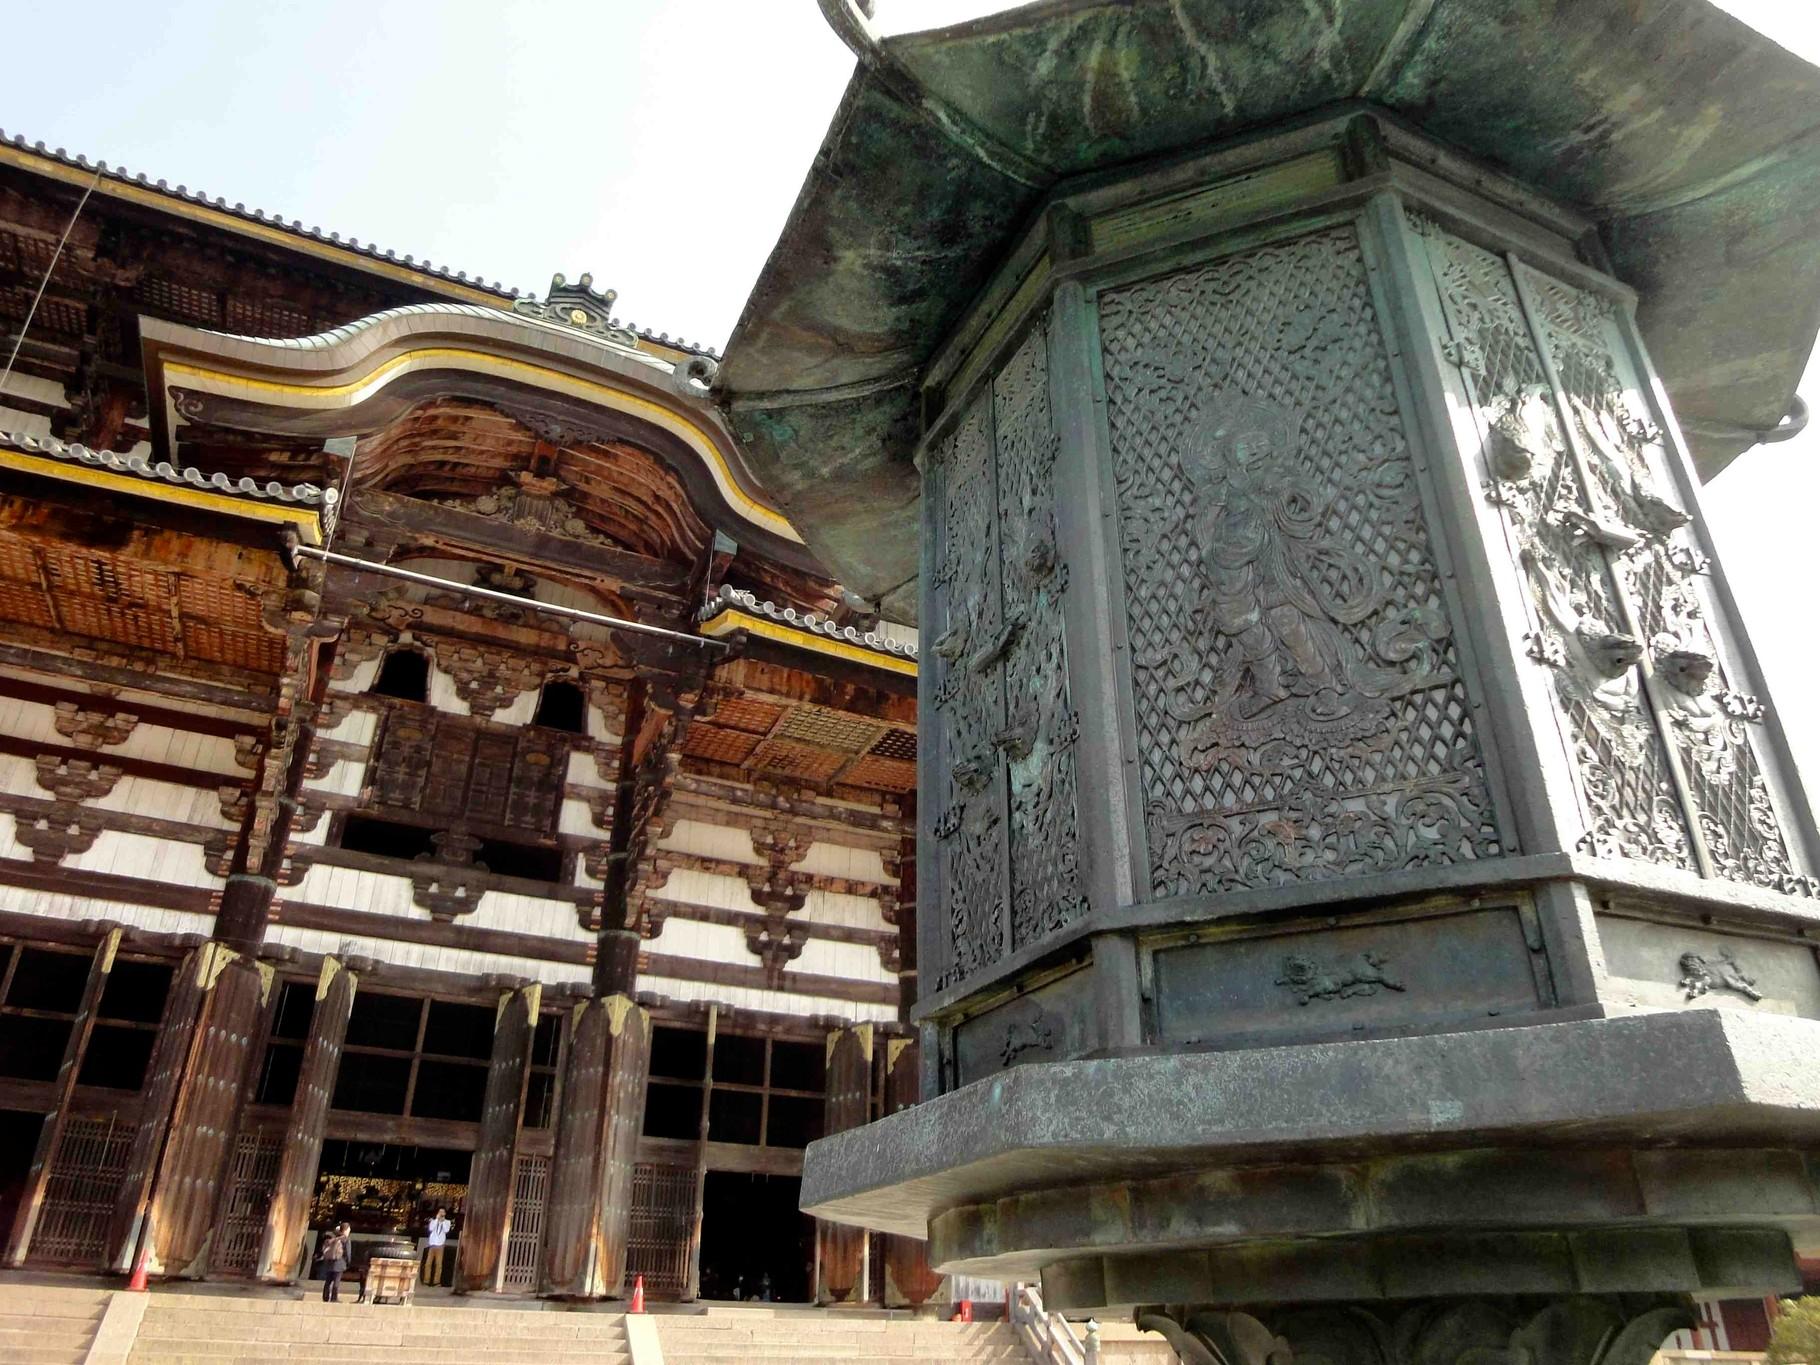 サイト内検索ブログ更新情報東大寺八角燈籠の音声菩薩像、大仏蓮弁の線刻画